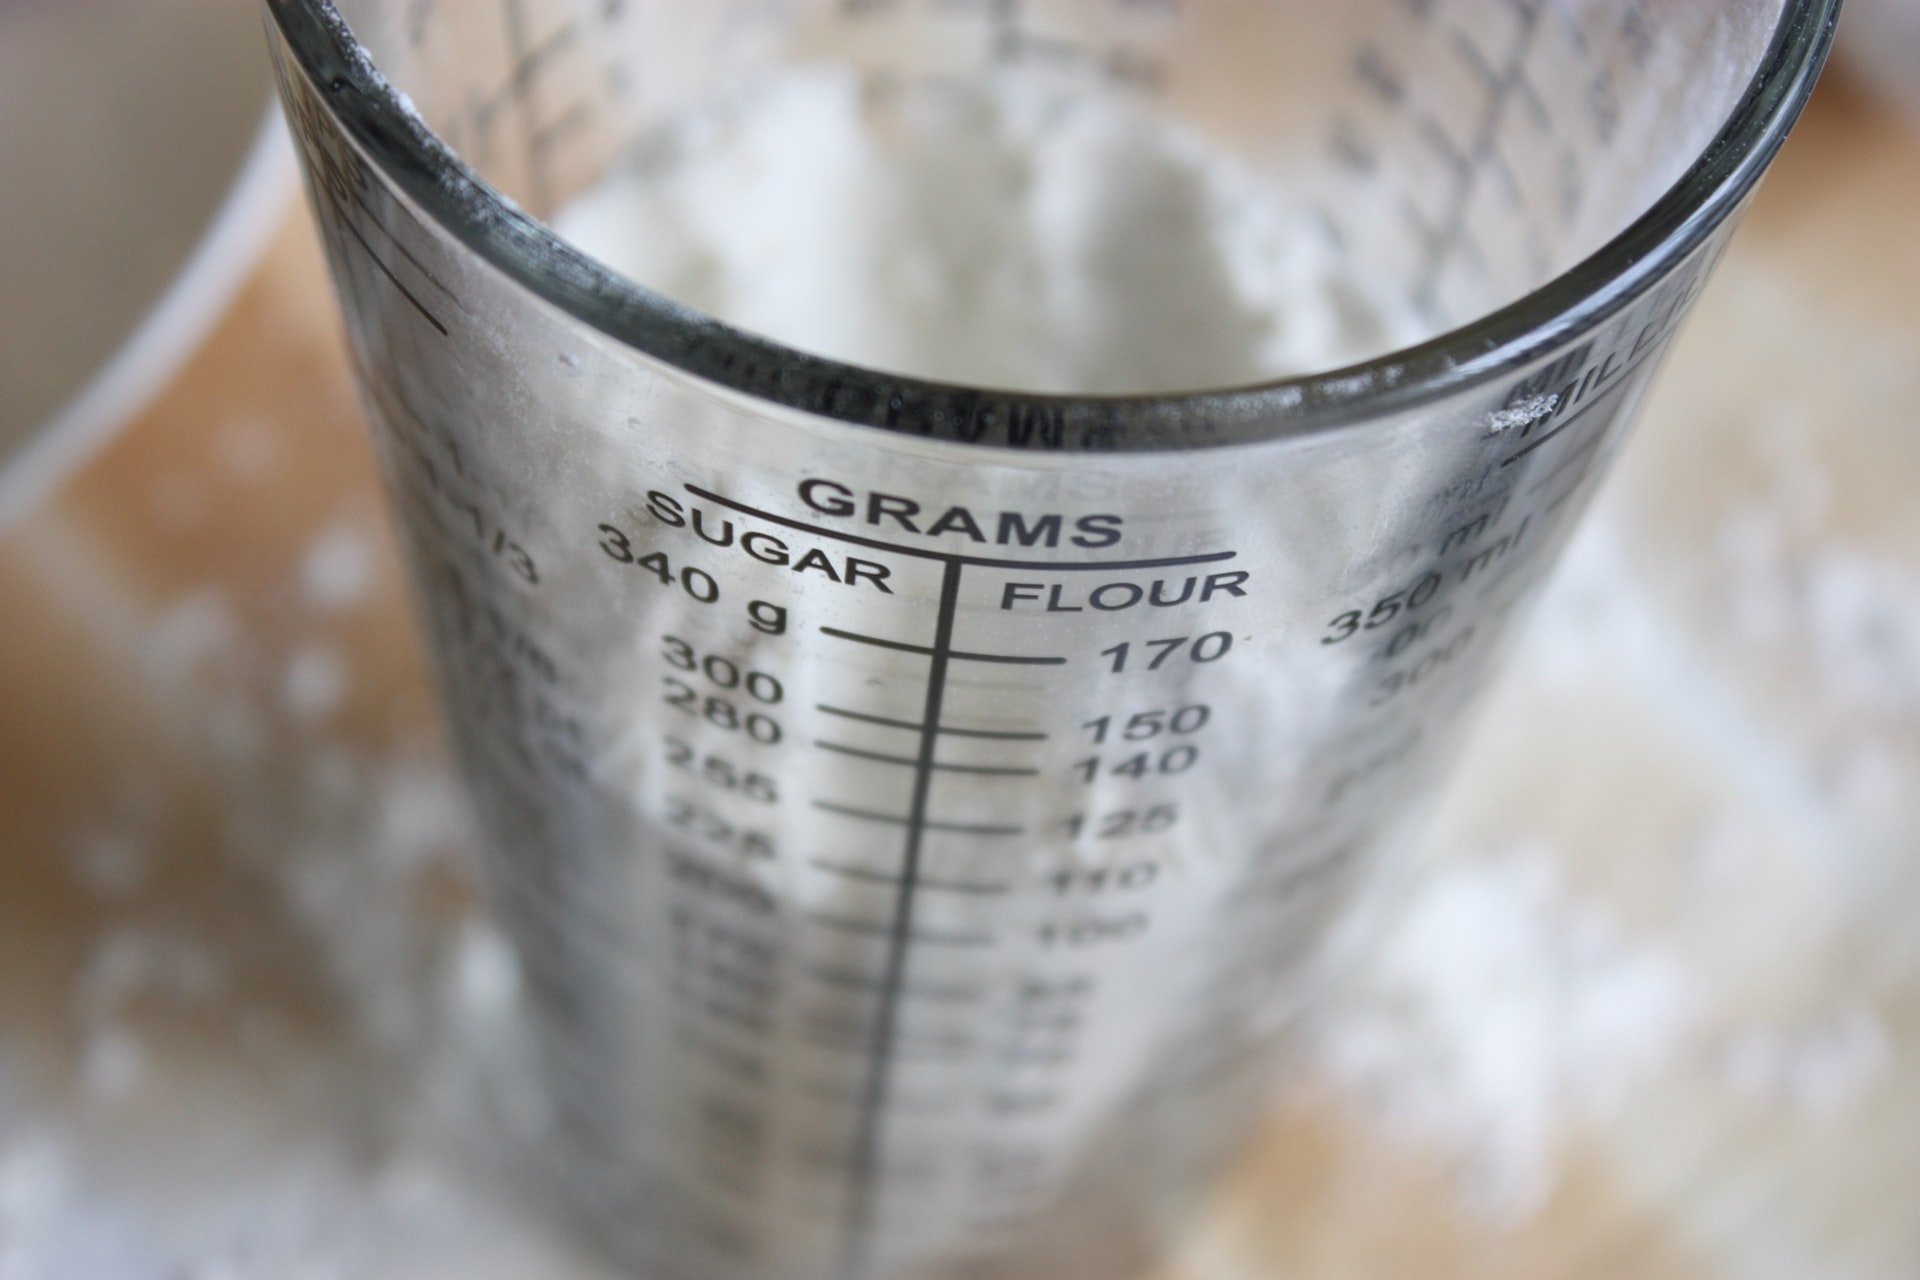 measuring beaker with sugar in it